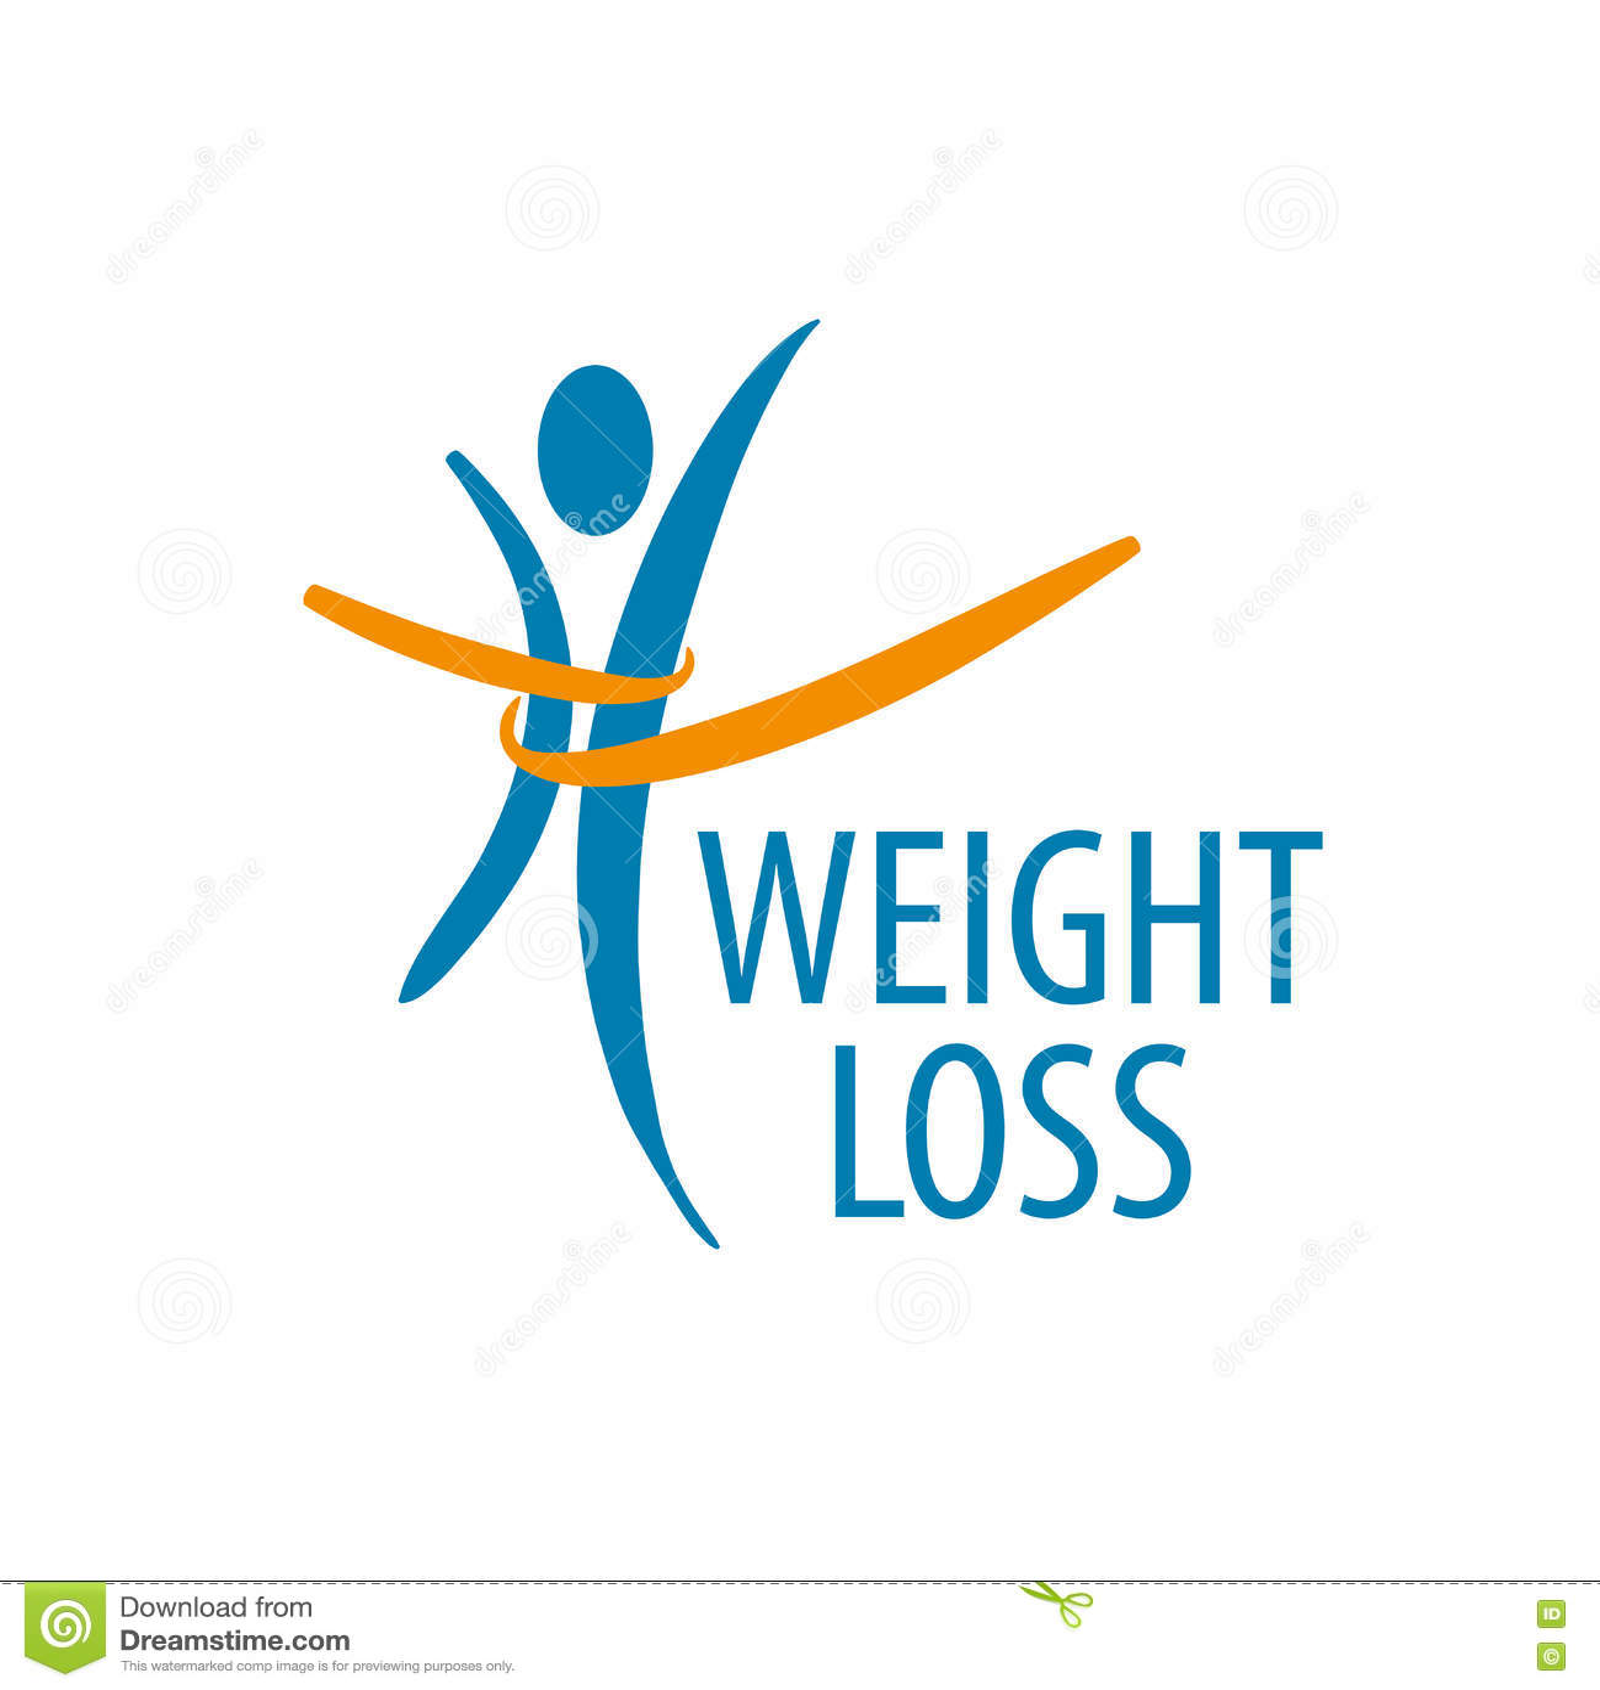 weight loss logo stock vector illustration of diet kilogram 80667969